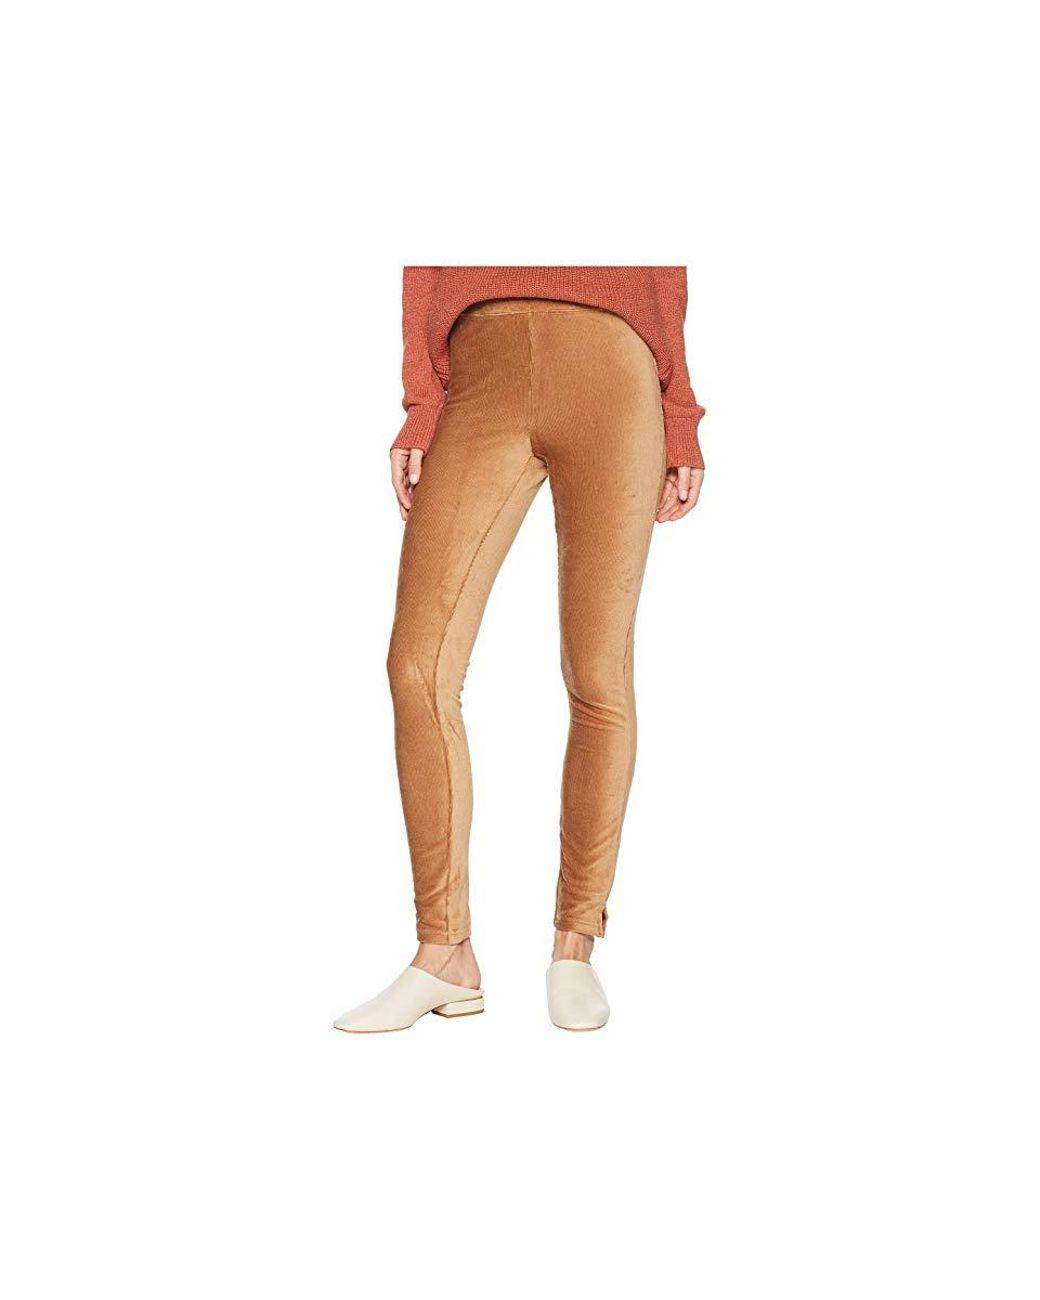 916681da42cab4 Hue High-waist Corduroy Leggings (caramel) Casual Pants in Brown - Lyst